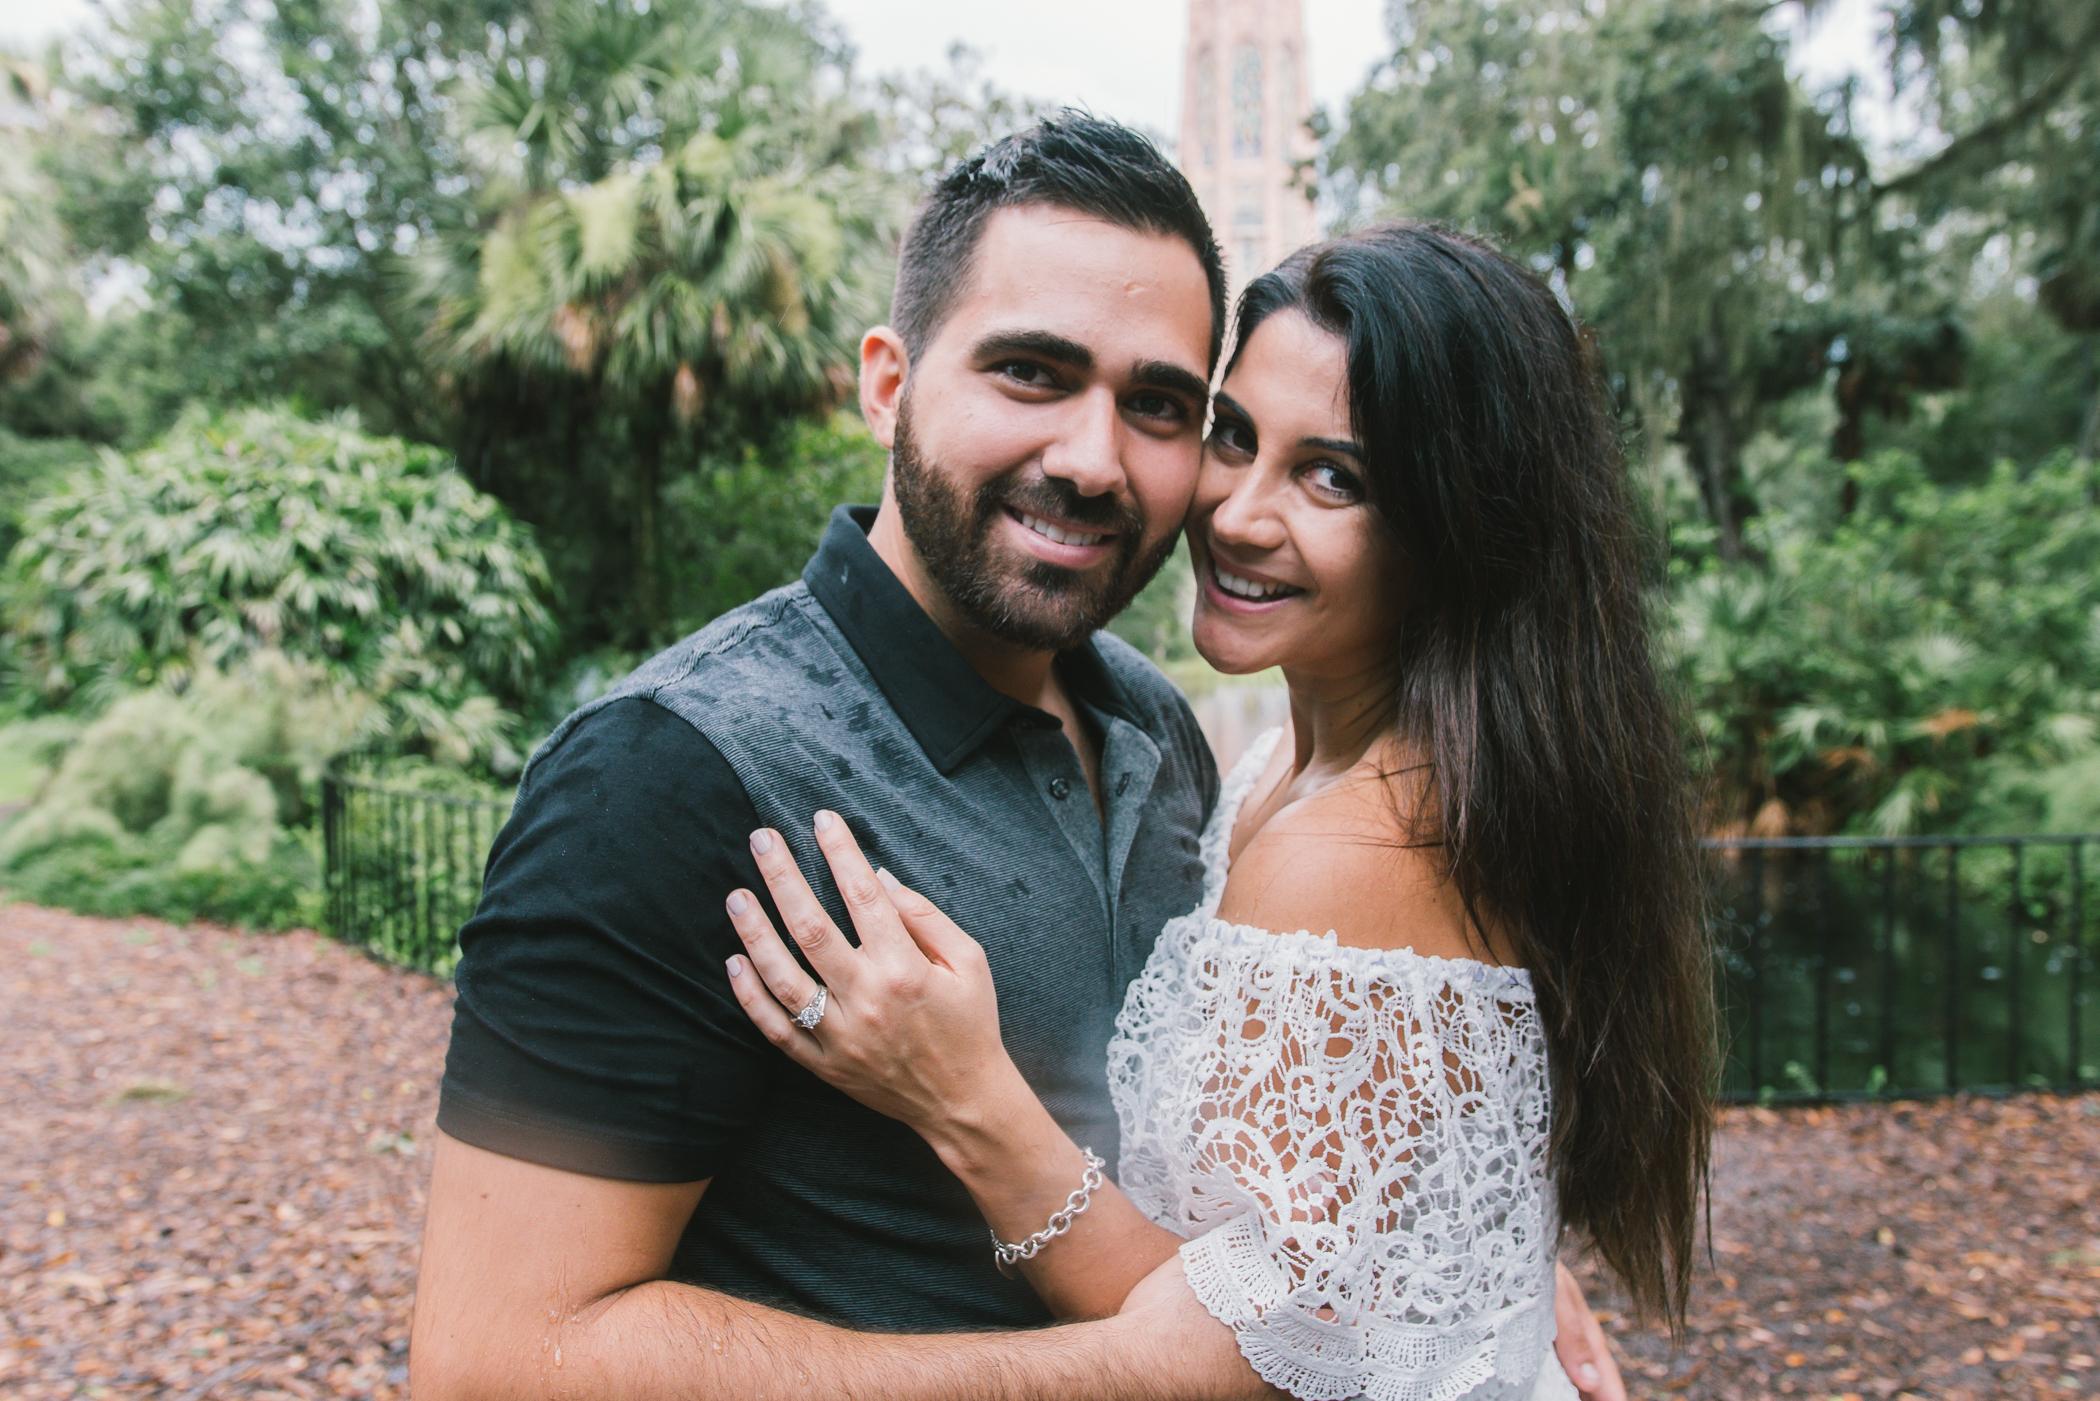 Bok-tower-rainy-engagement-session, Tampa-wedding-photographer